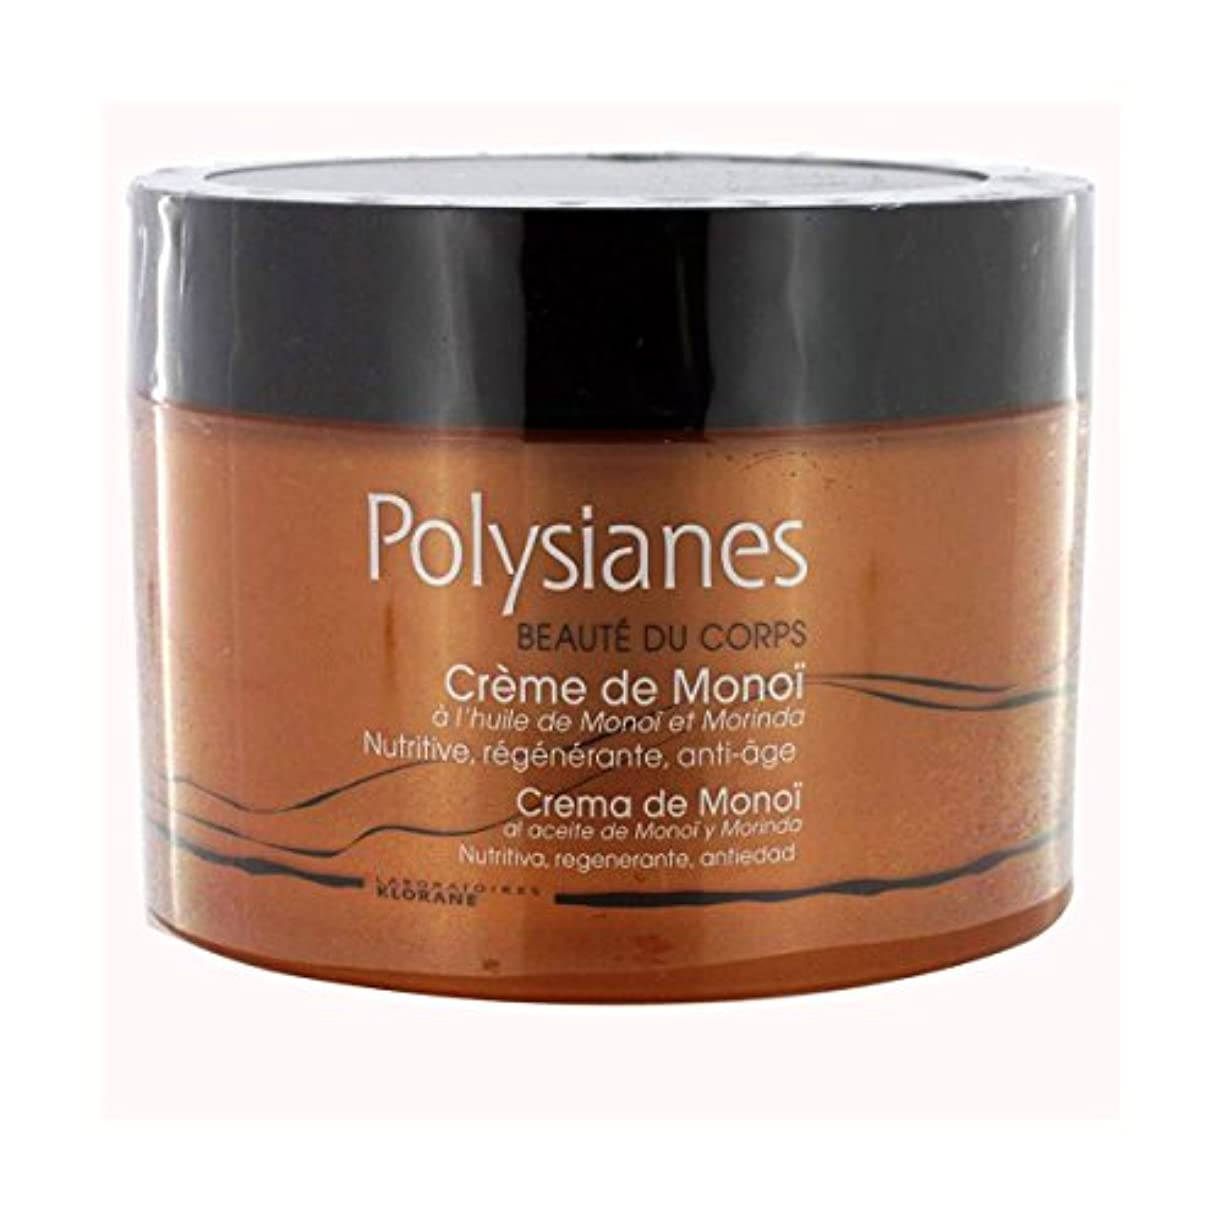 音湿度粗いPolysianes Body Beauty Monoi Cream 200ml [並行輸入品]